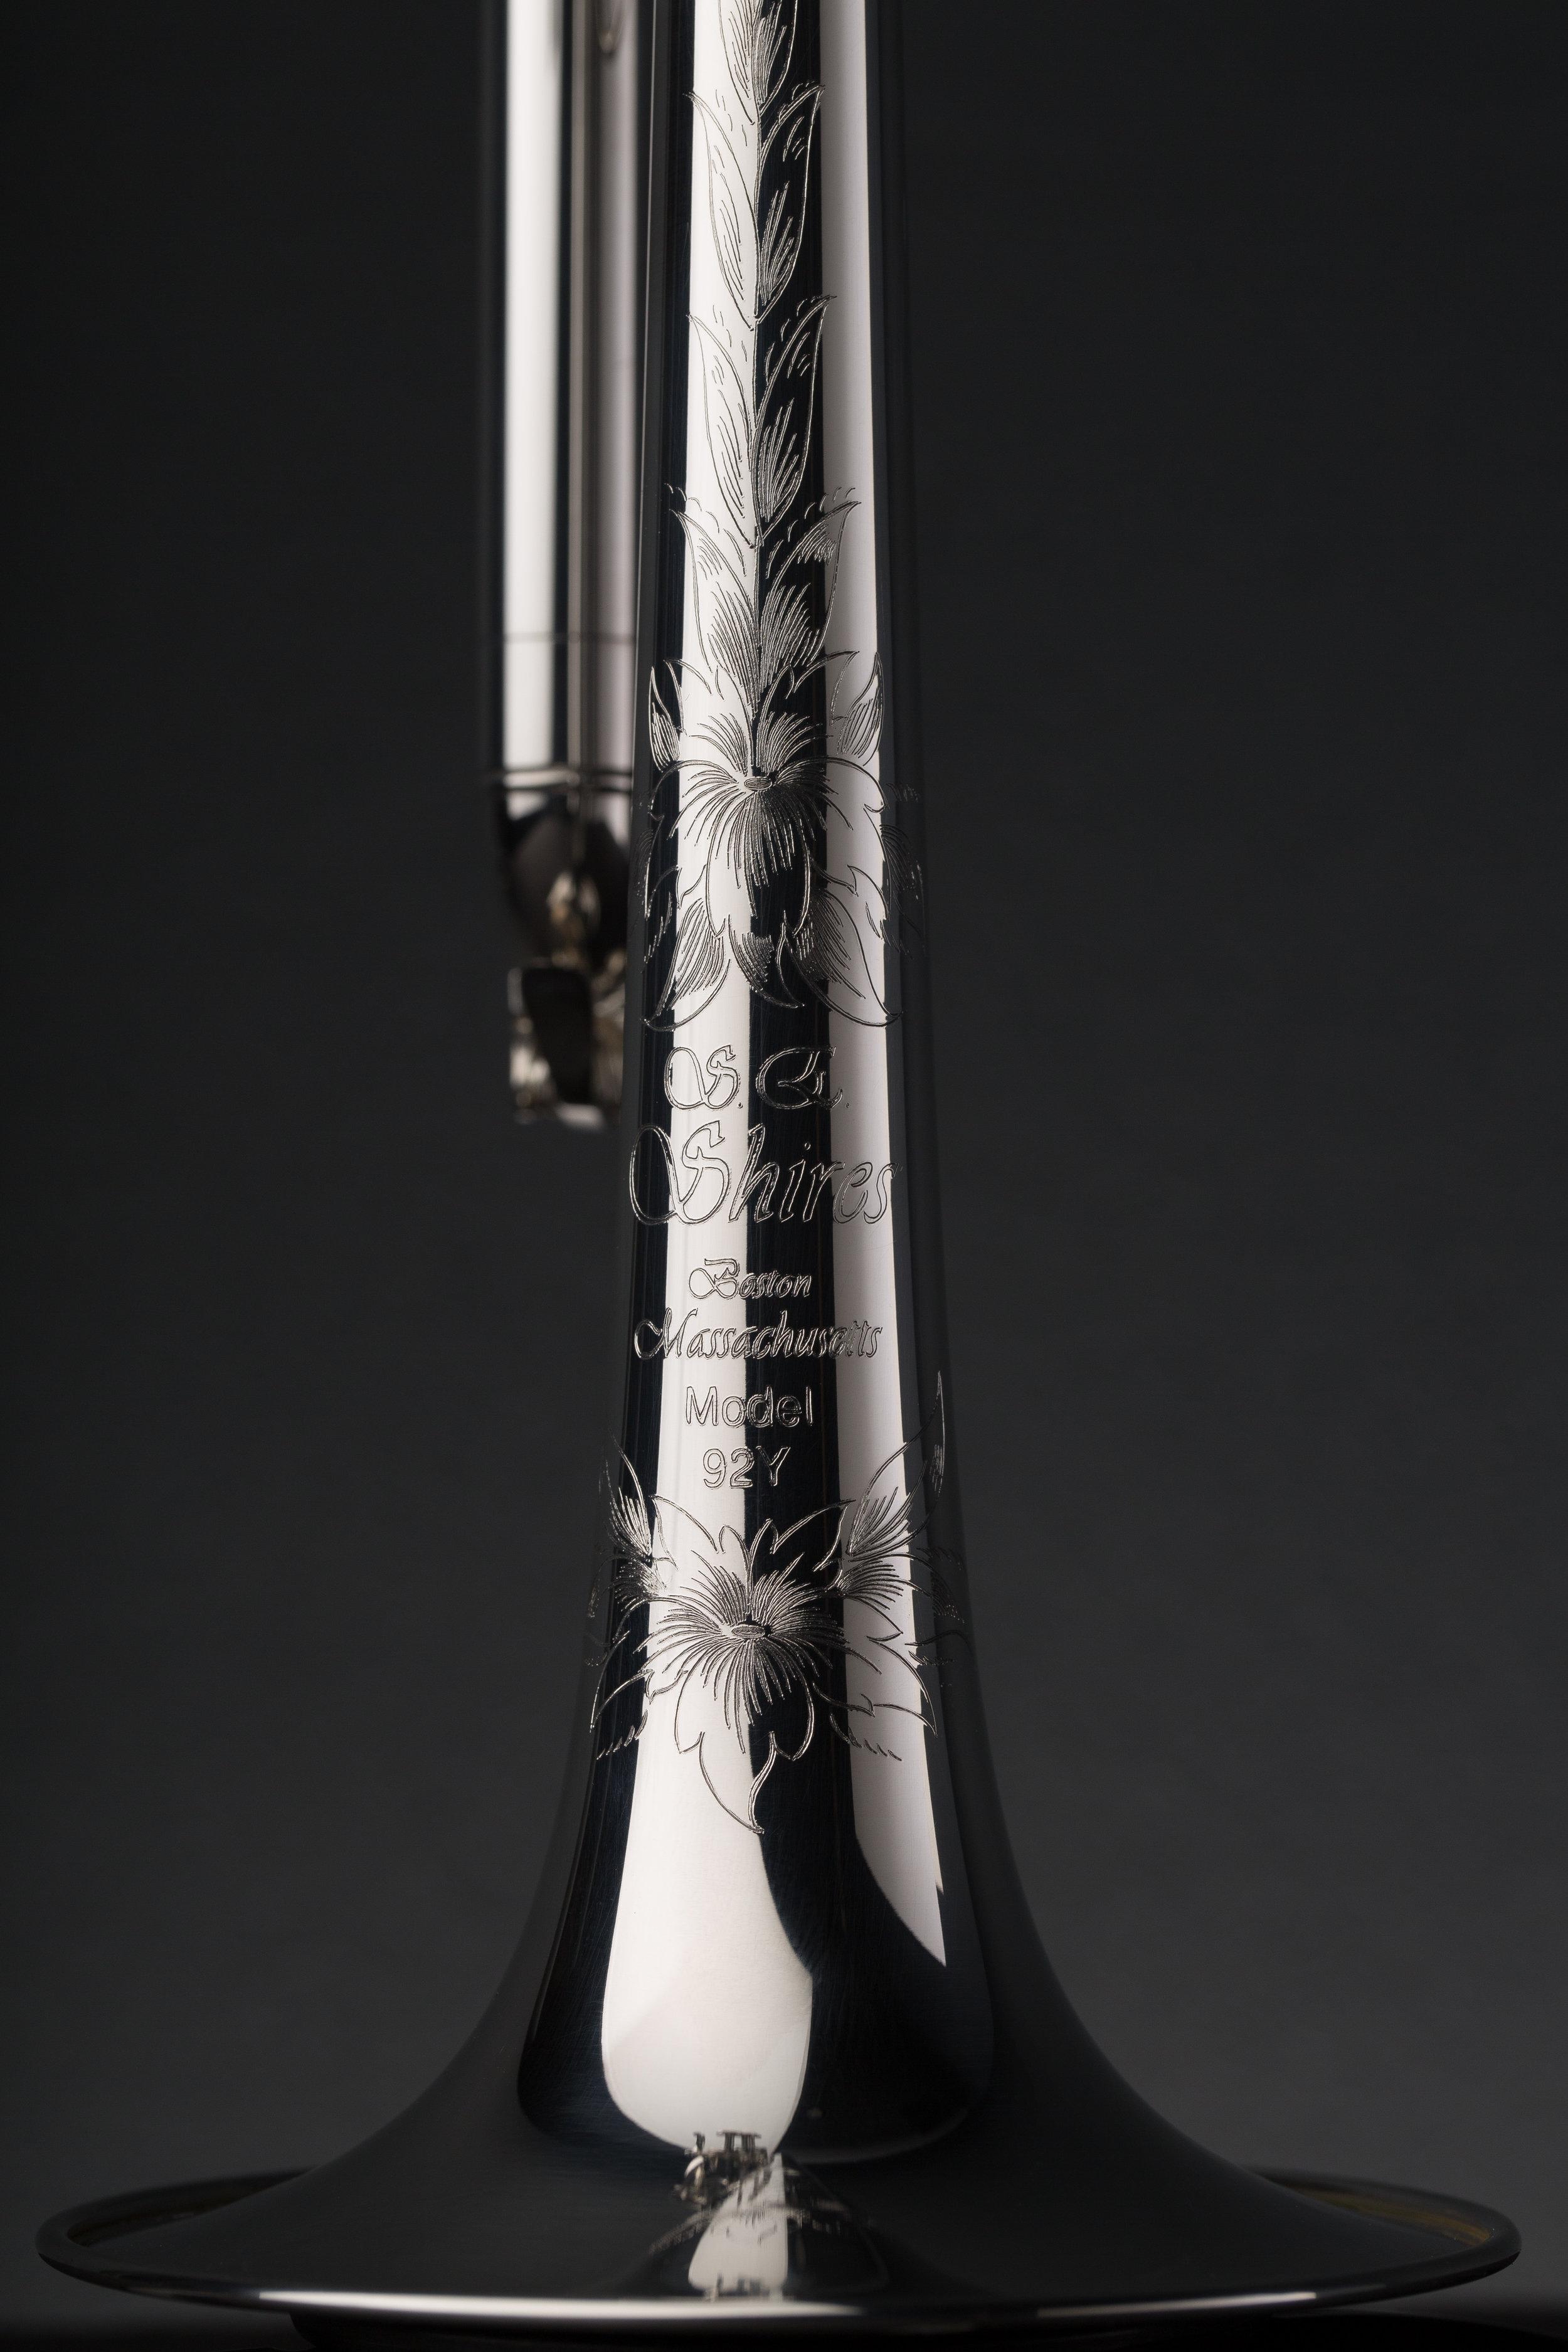 Shires_Trumpet_Model_92Y_TestBell_1016.jpg